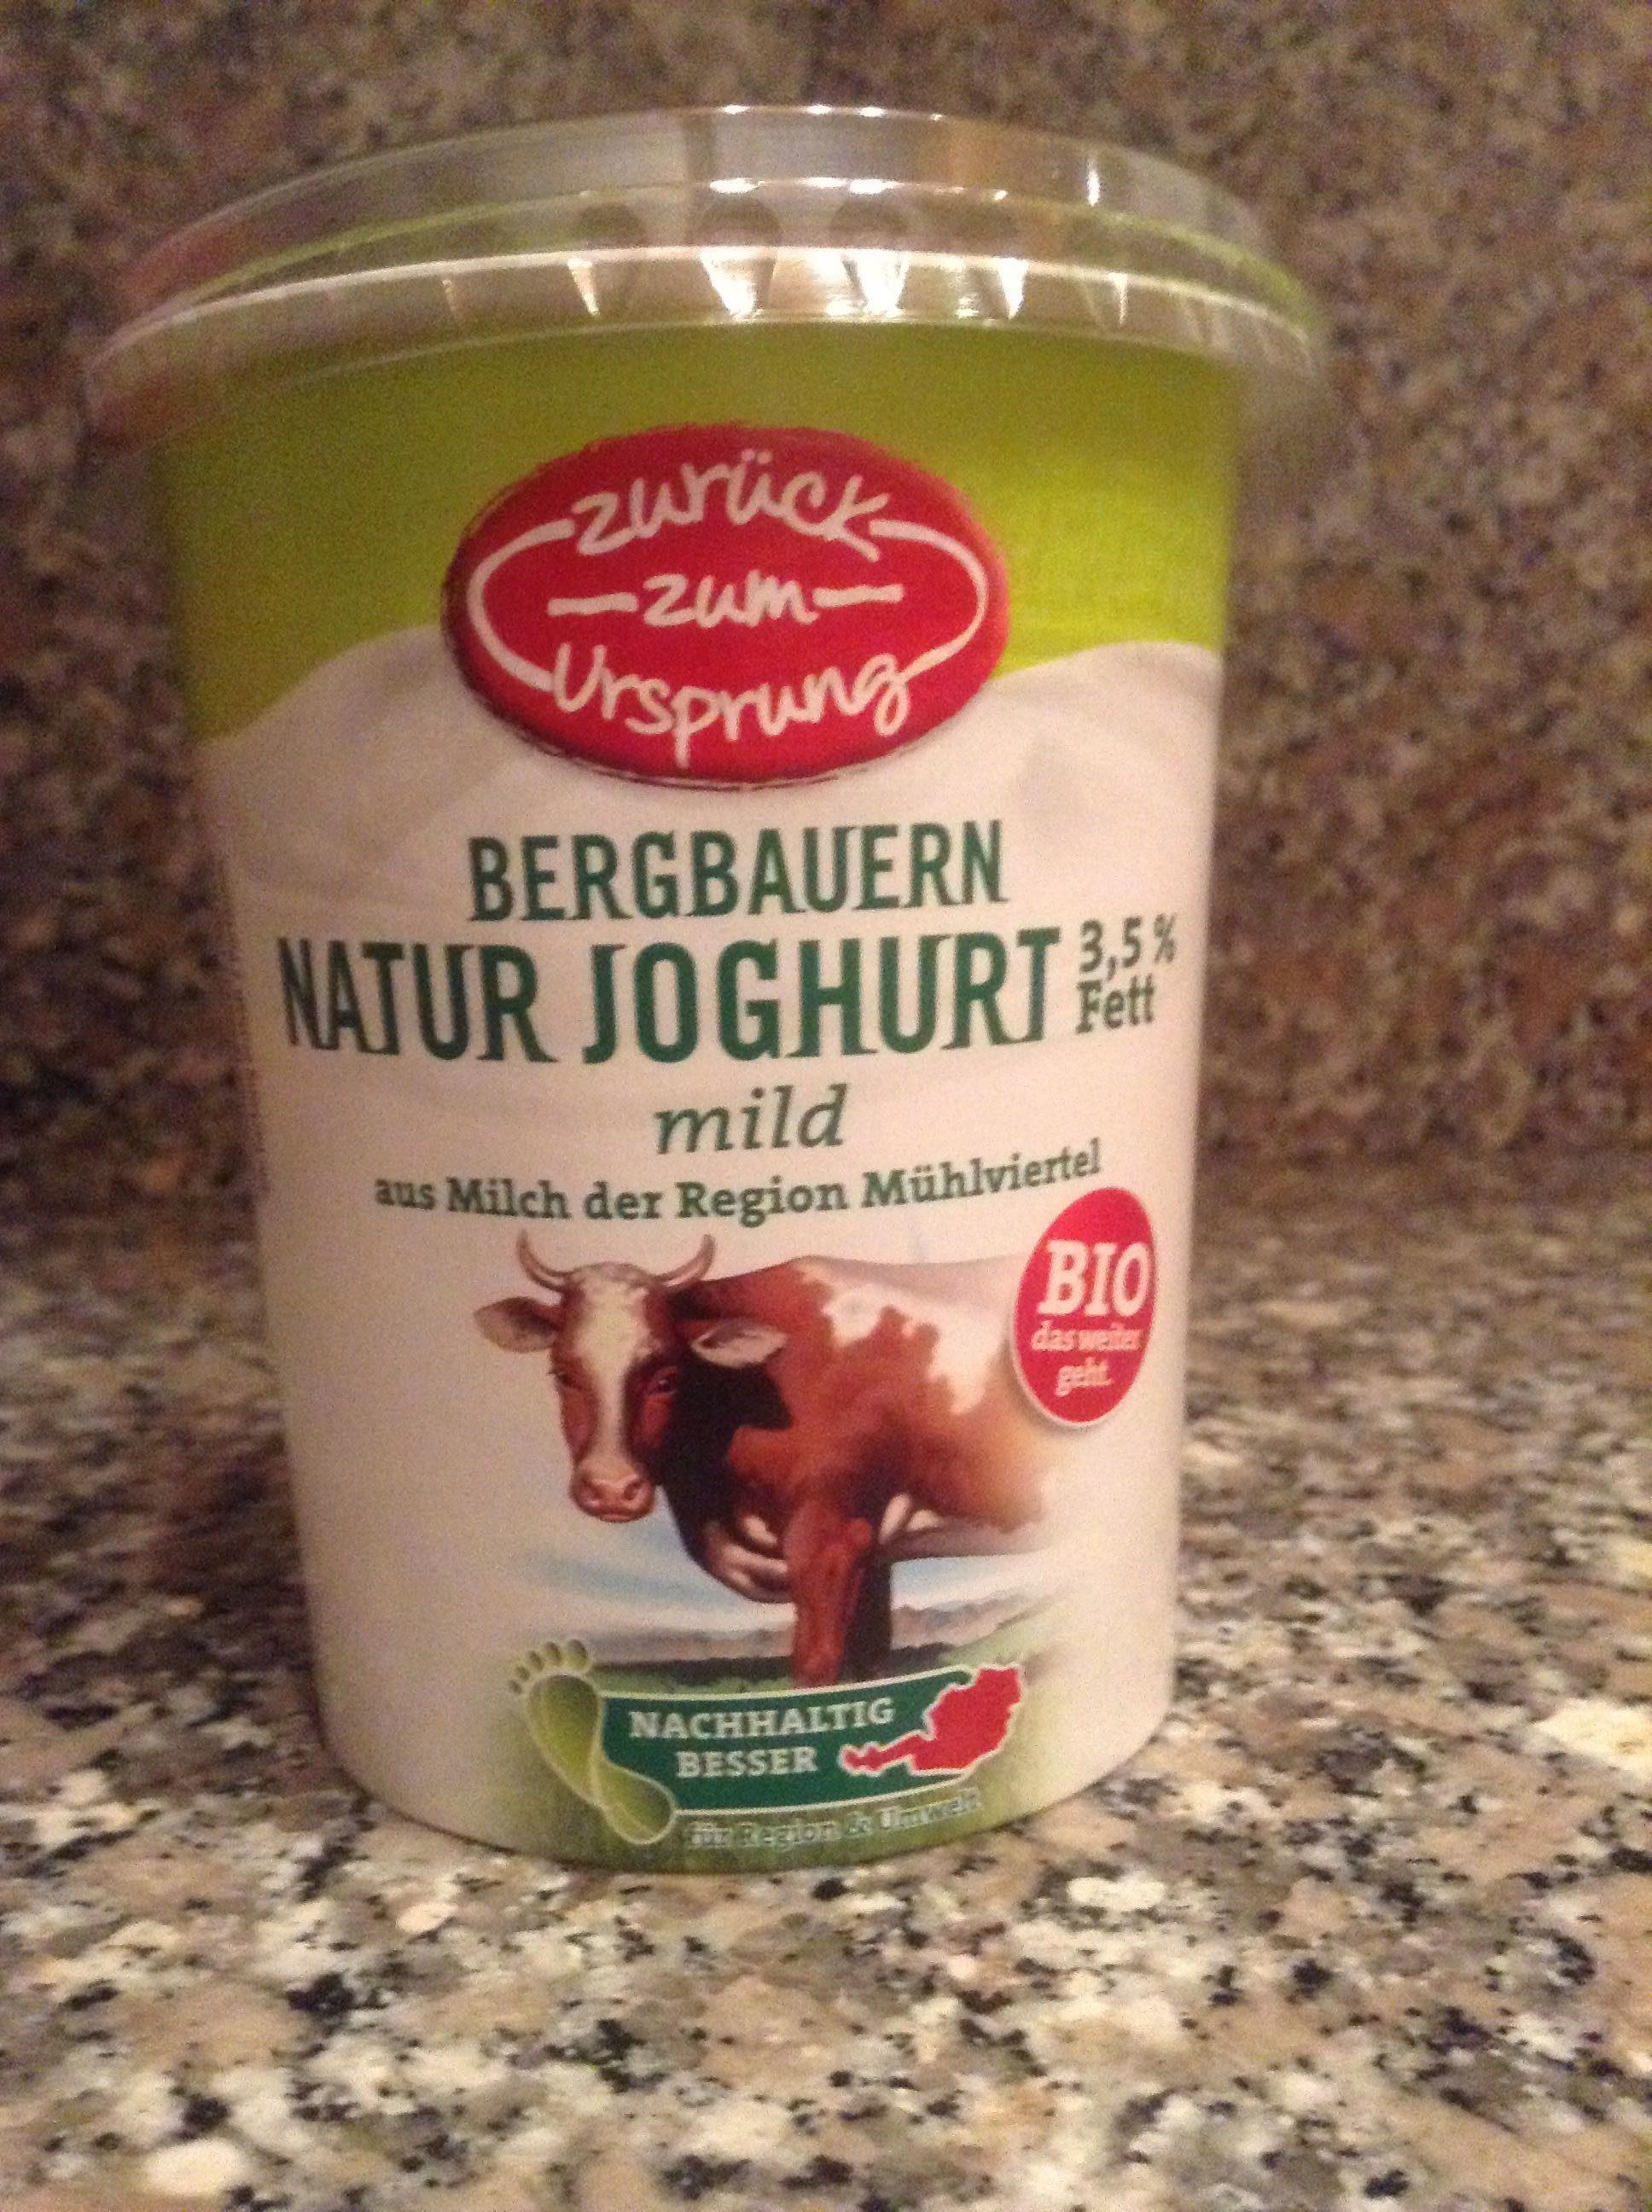 Bergbauern Naturjoghurt - Product